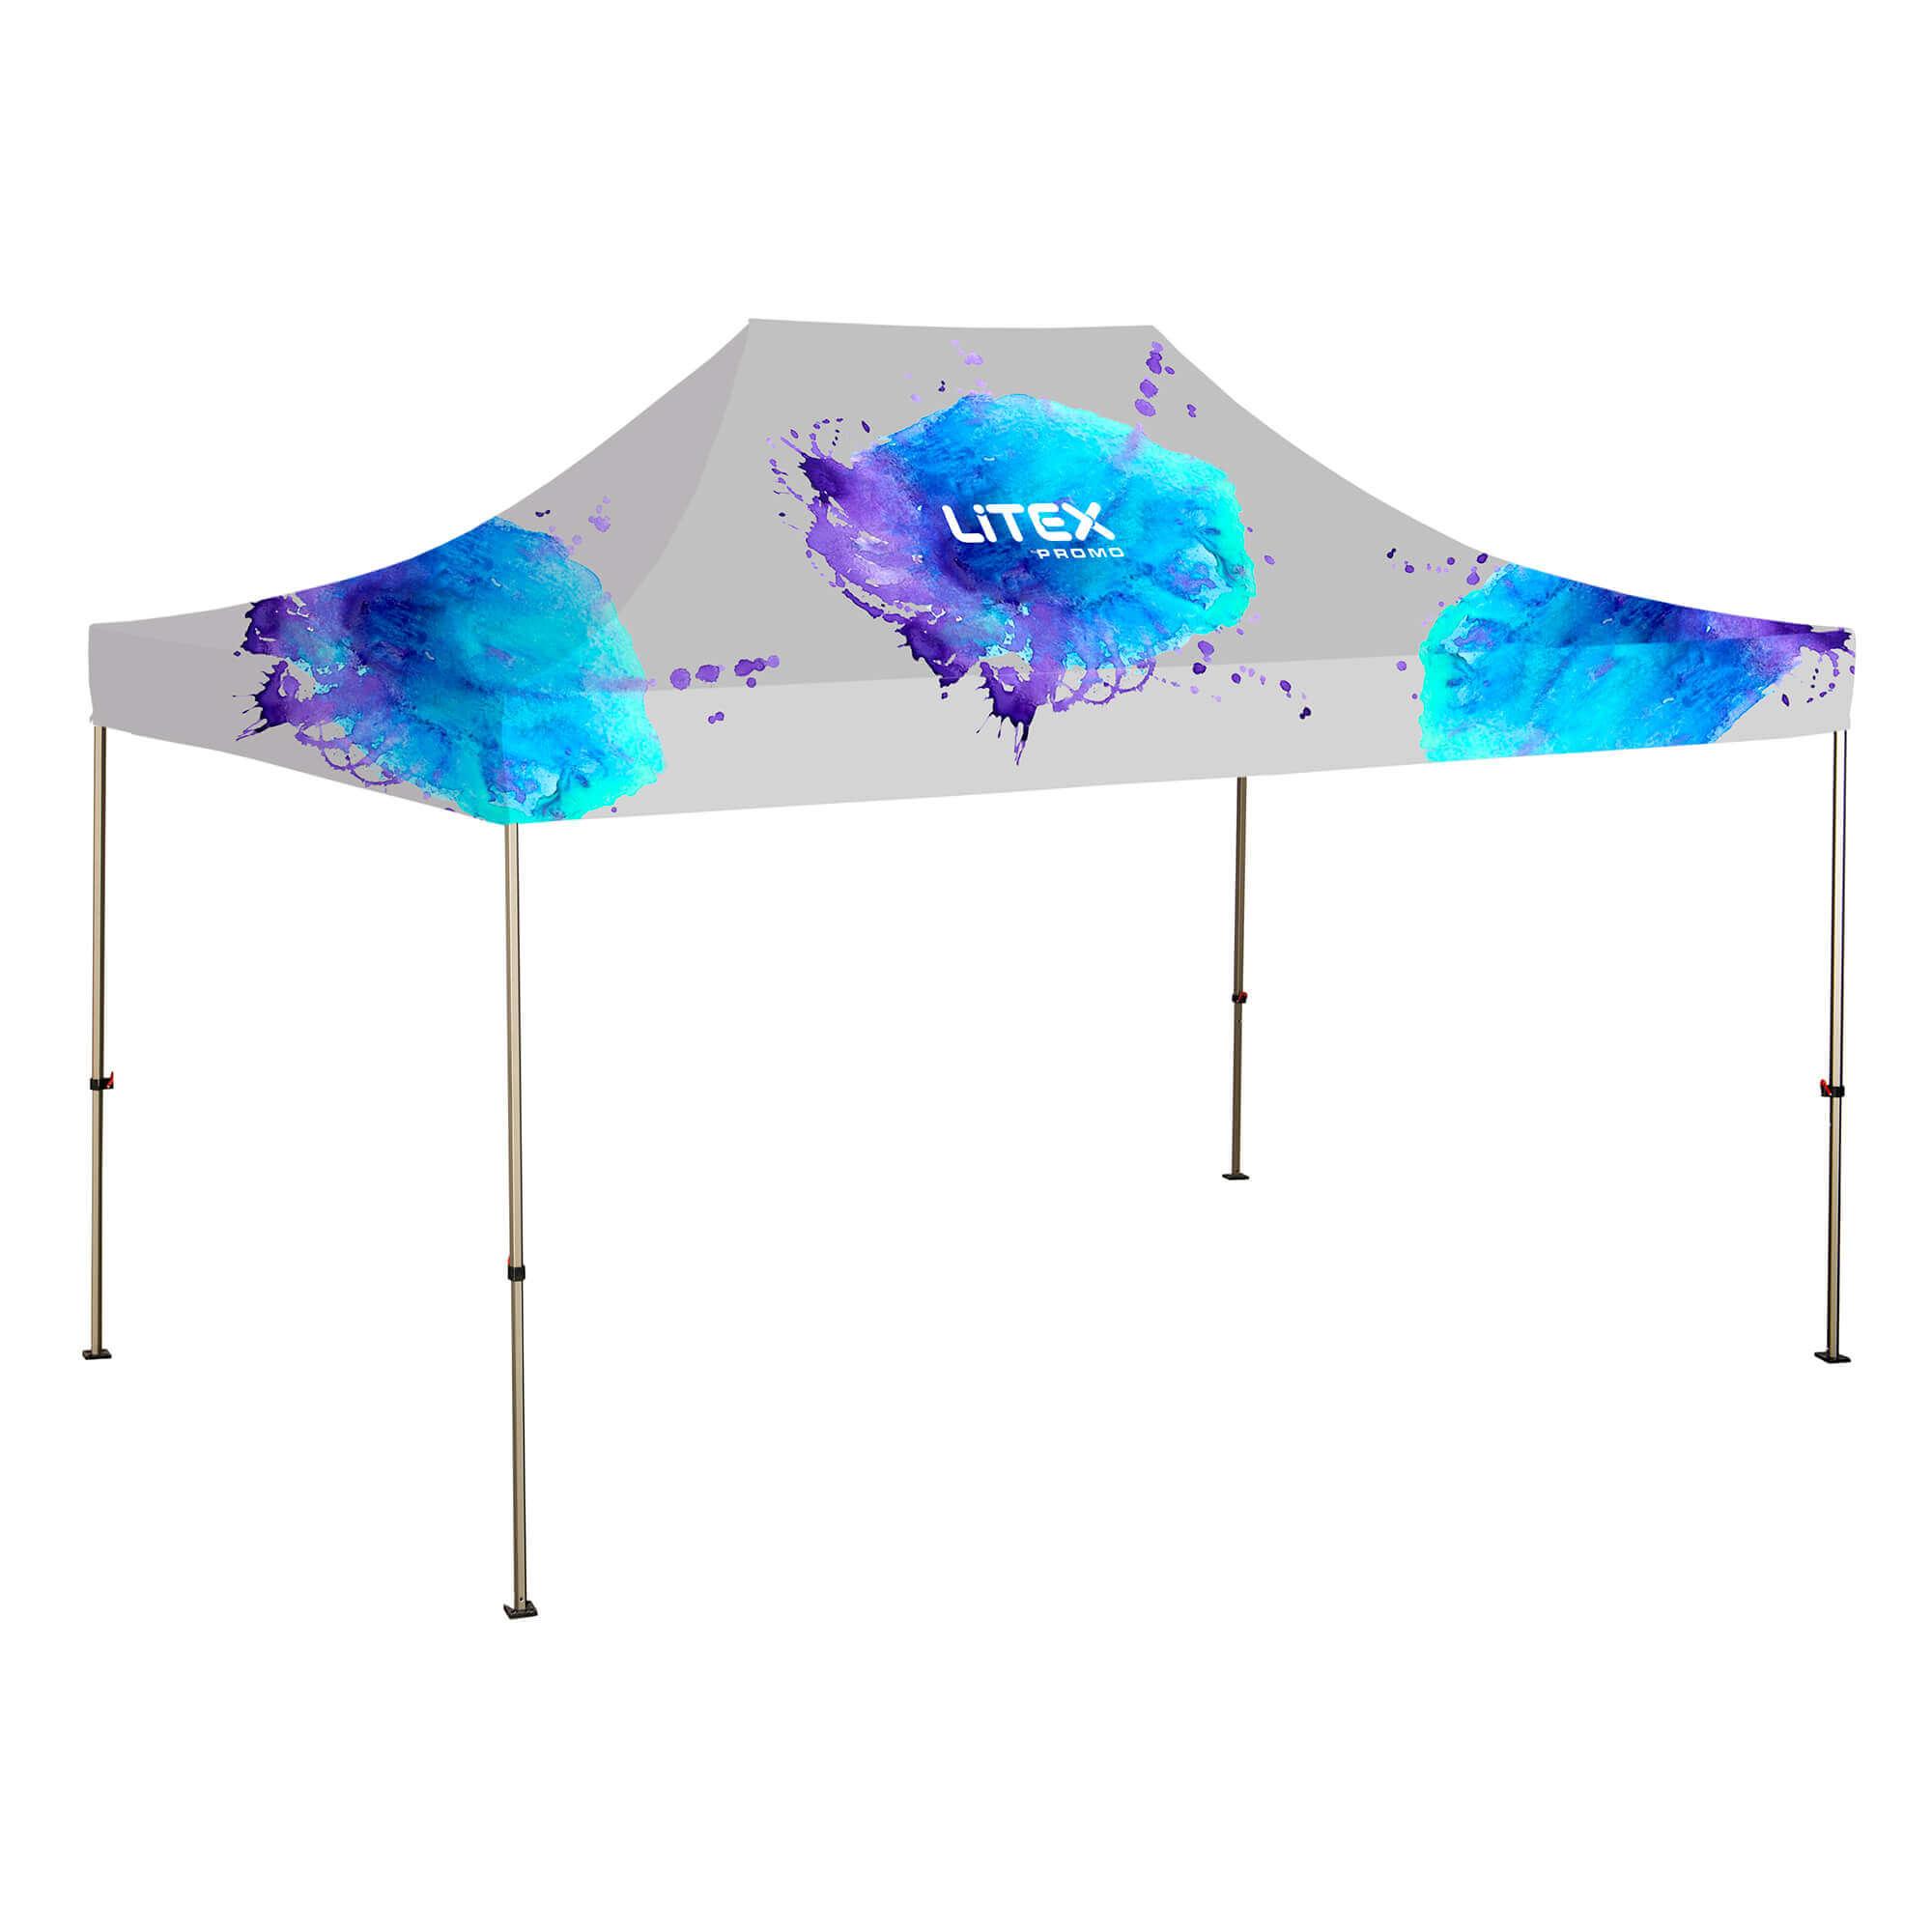 1. Namiot Szybkorozkładalny 3 x 4,5 m